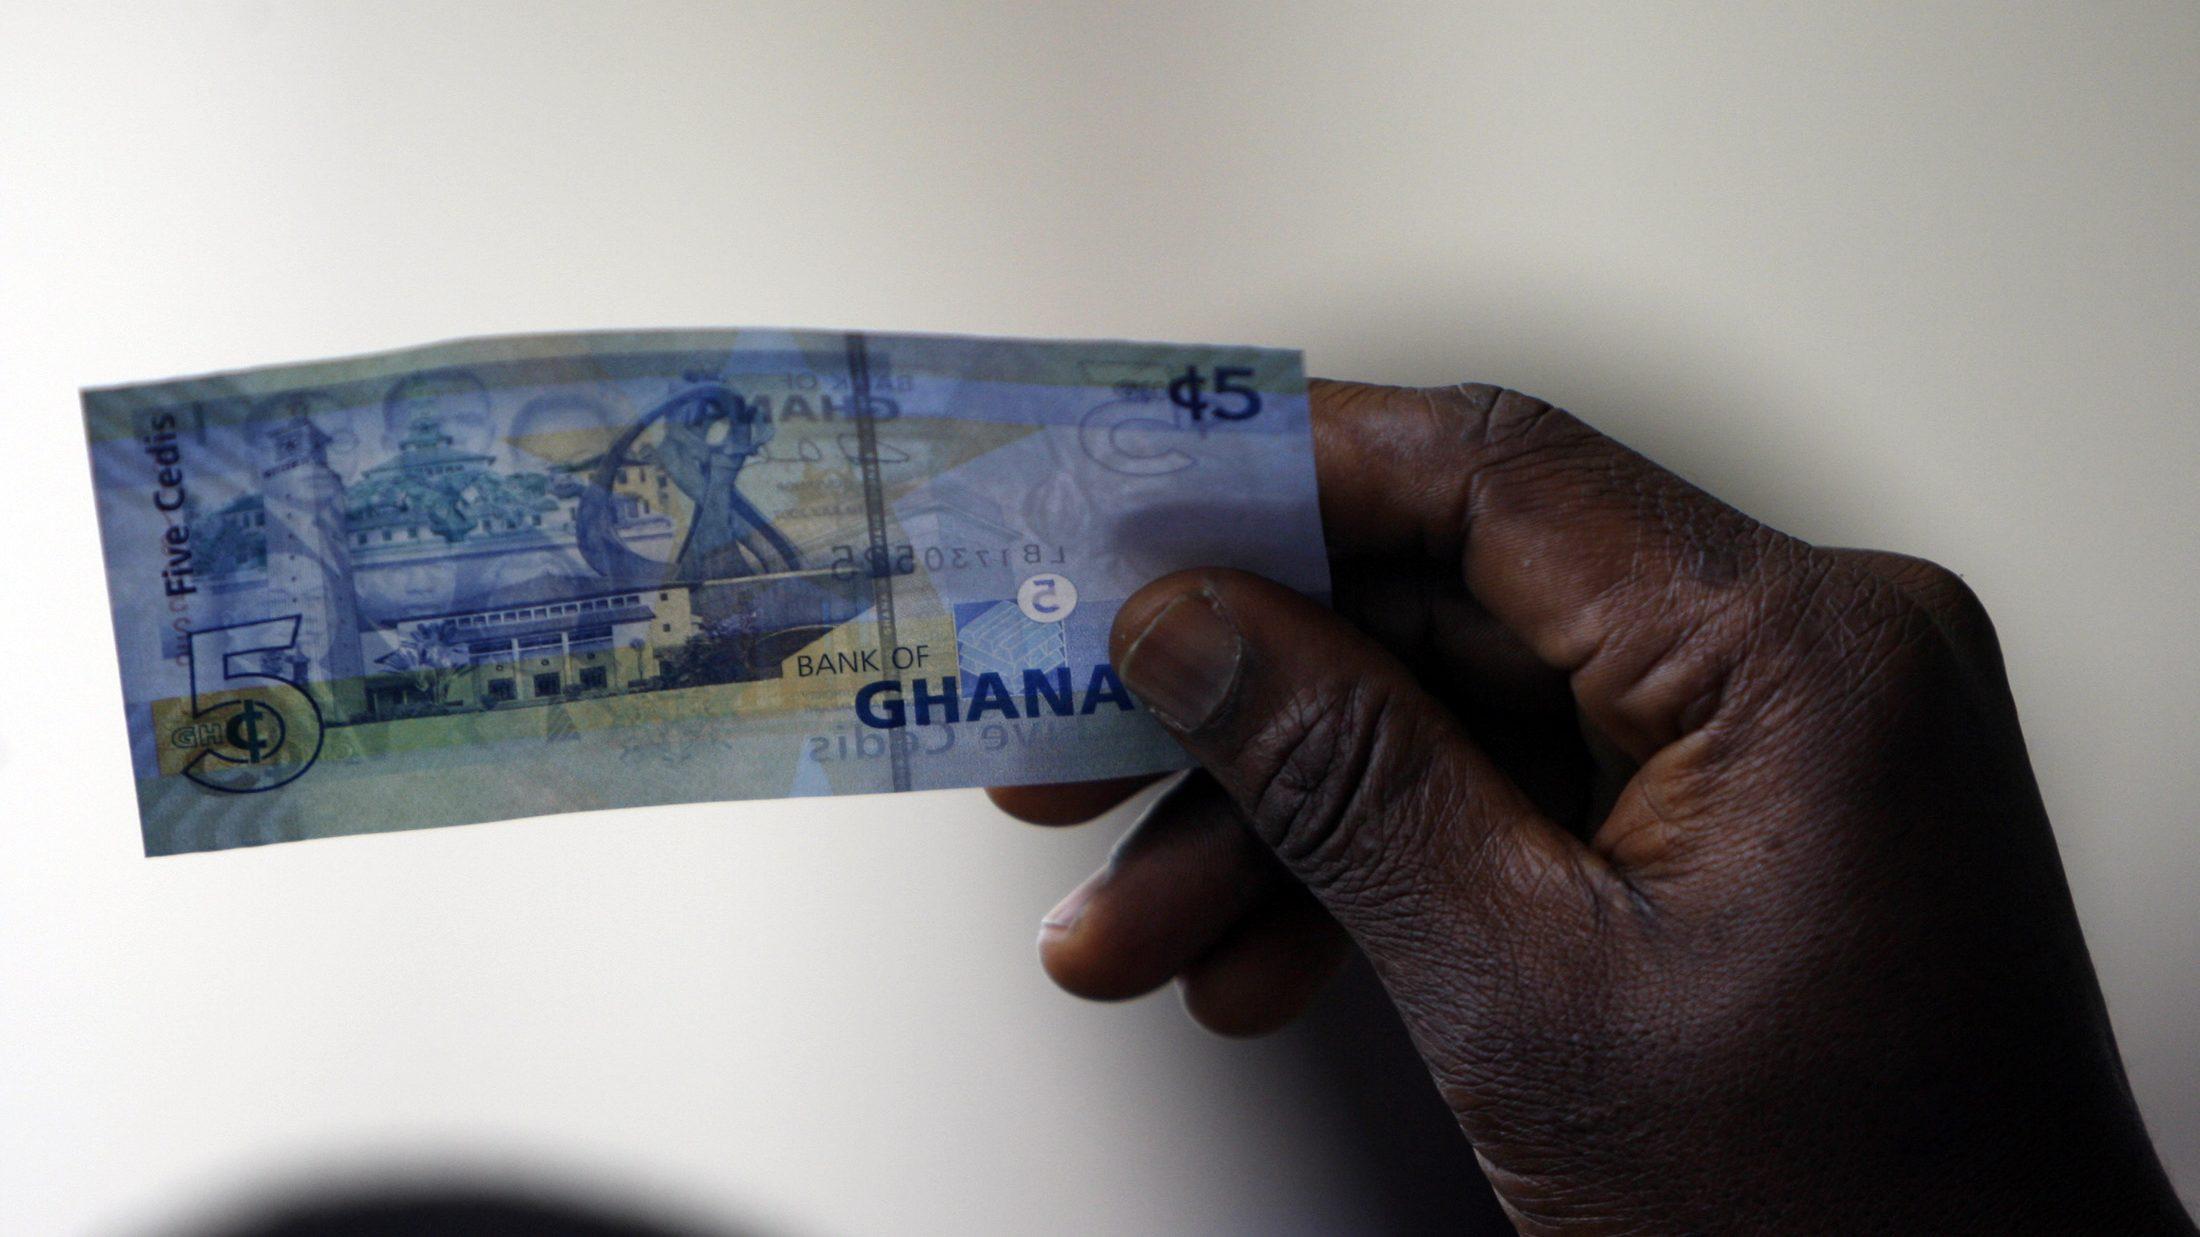 A man holds a Ghanaian five cedi note.